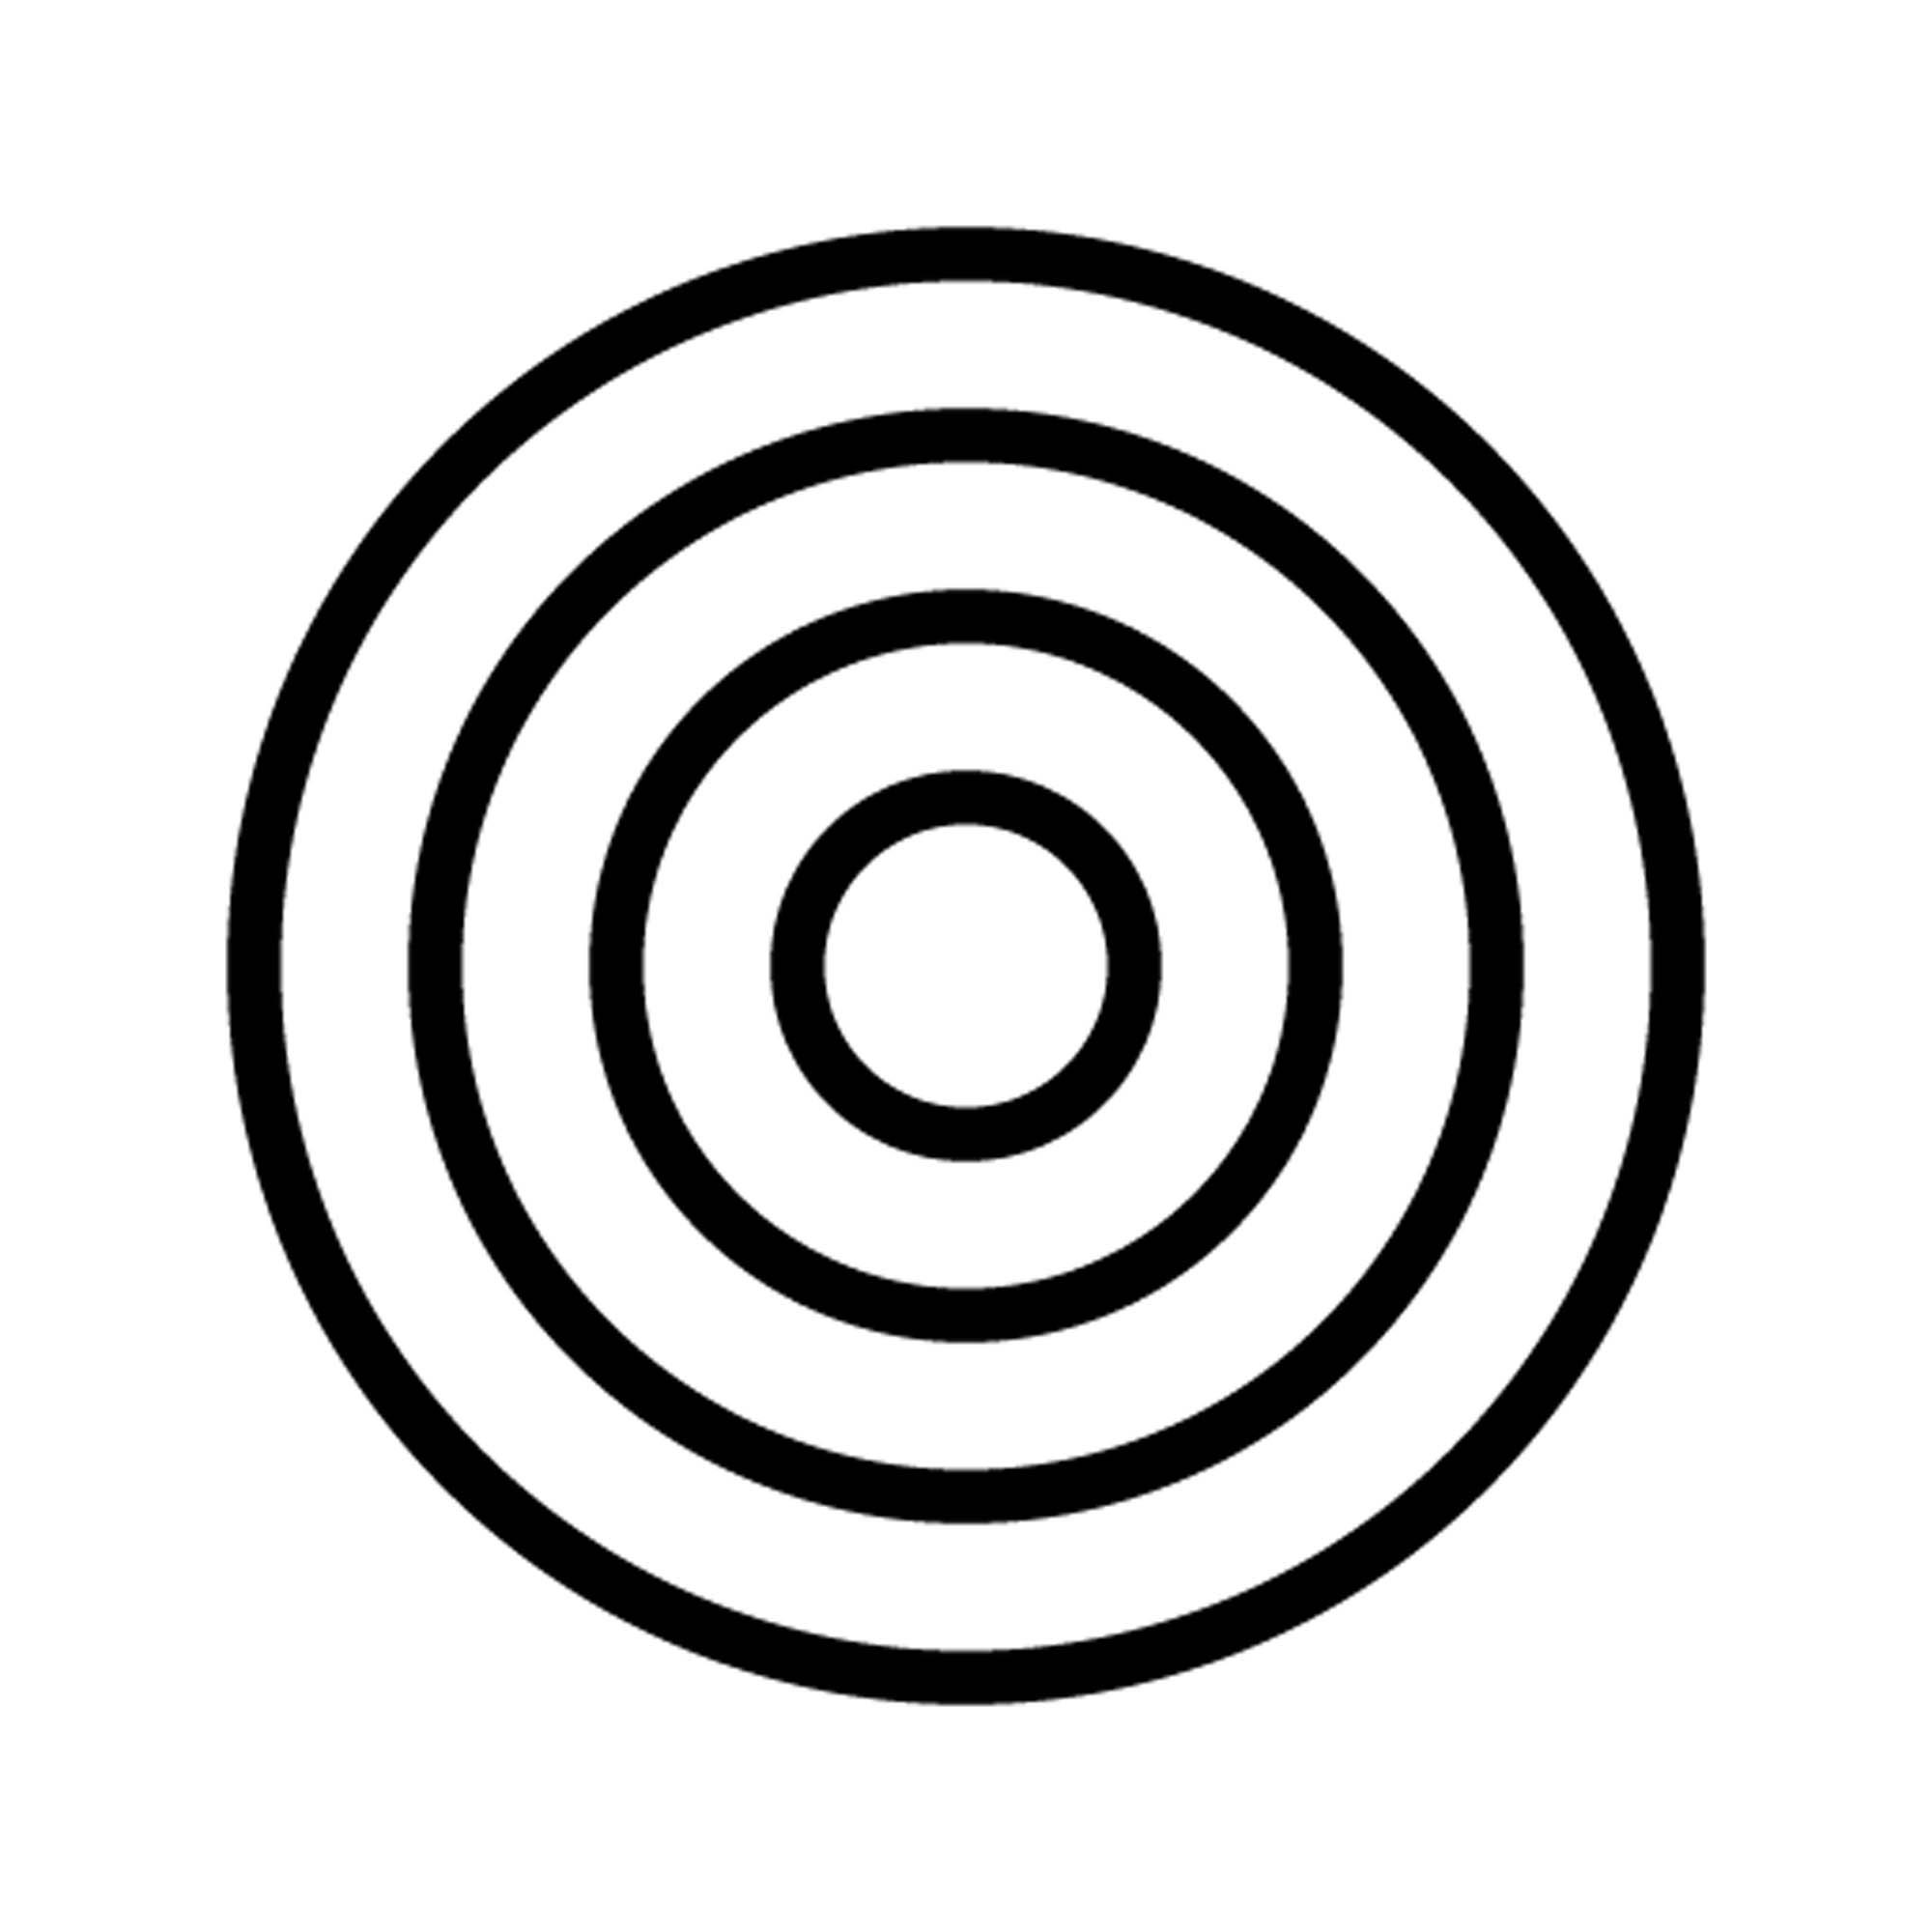 Positioning target image